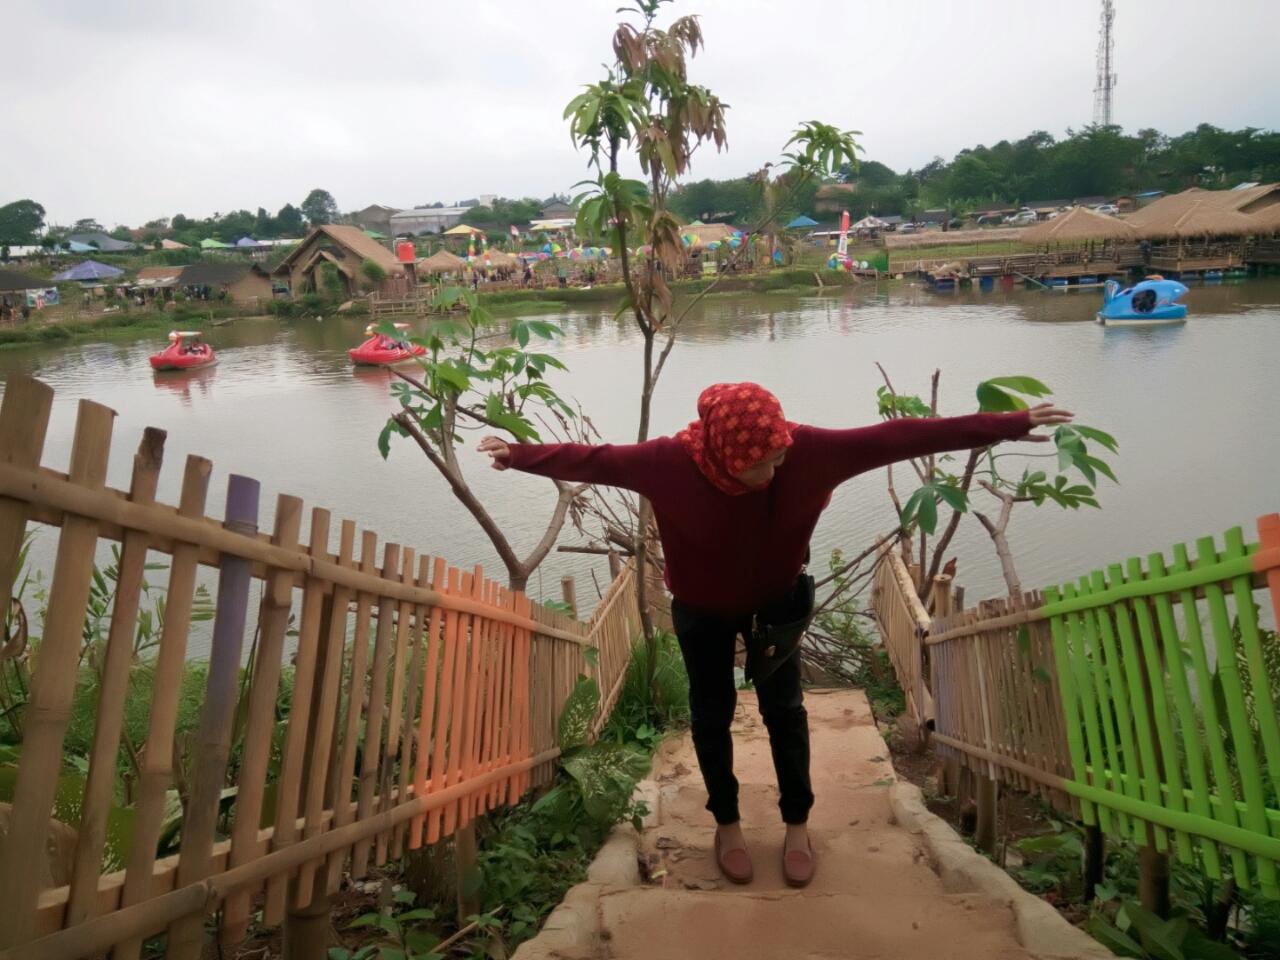 Ceritaku Ceritamu Taman Limo Cikarang Tempat Rekreasi